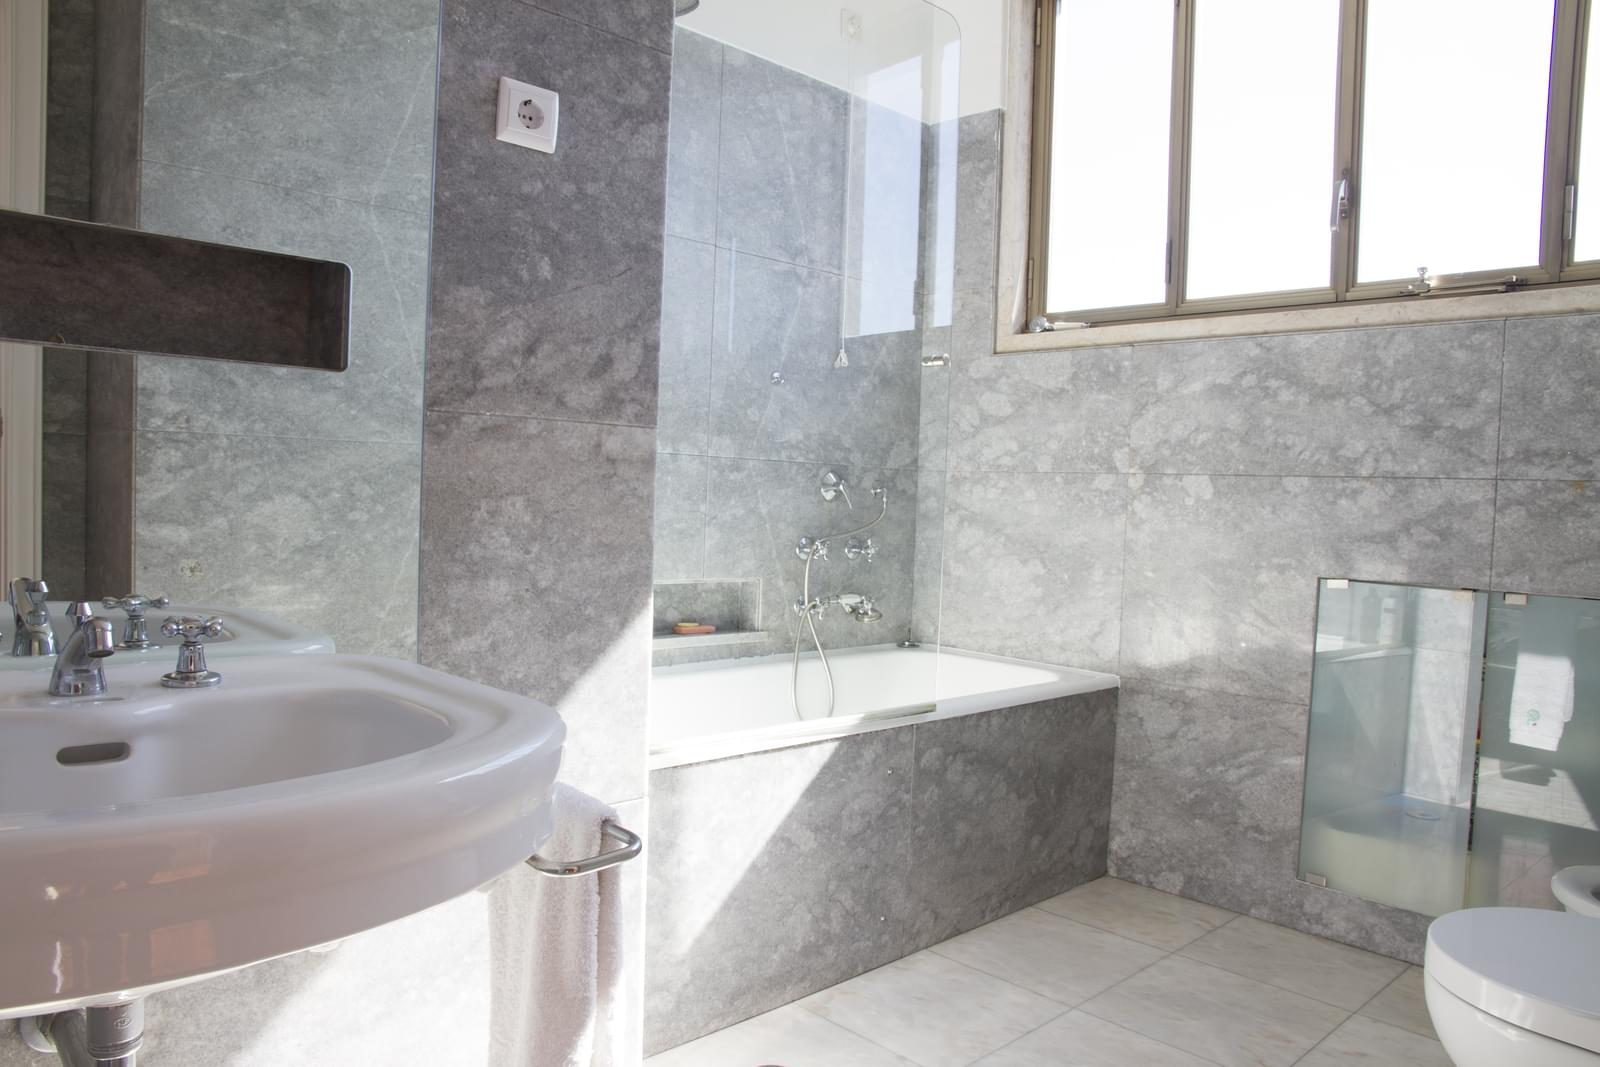 pf18175-apartamento-t5-lisboa-9f7c5ce4-0033-488f-81a4-6bcf72c87b7e